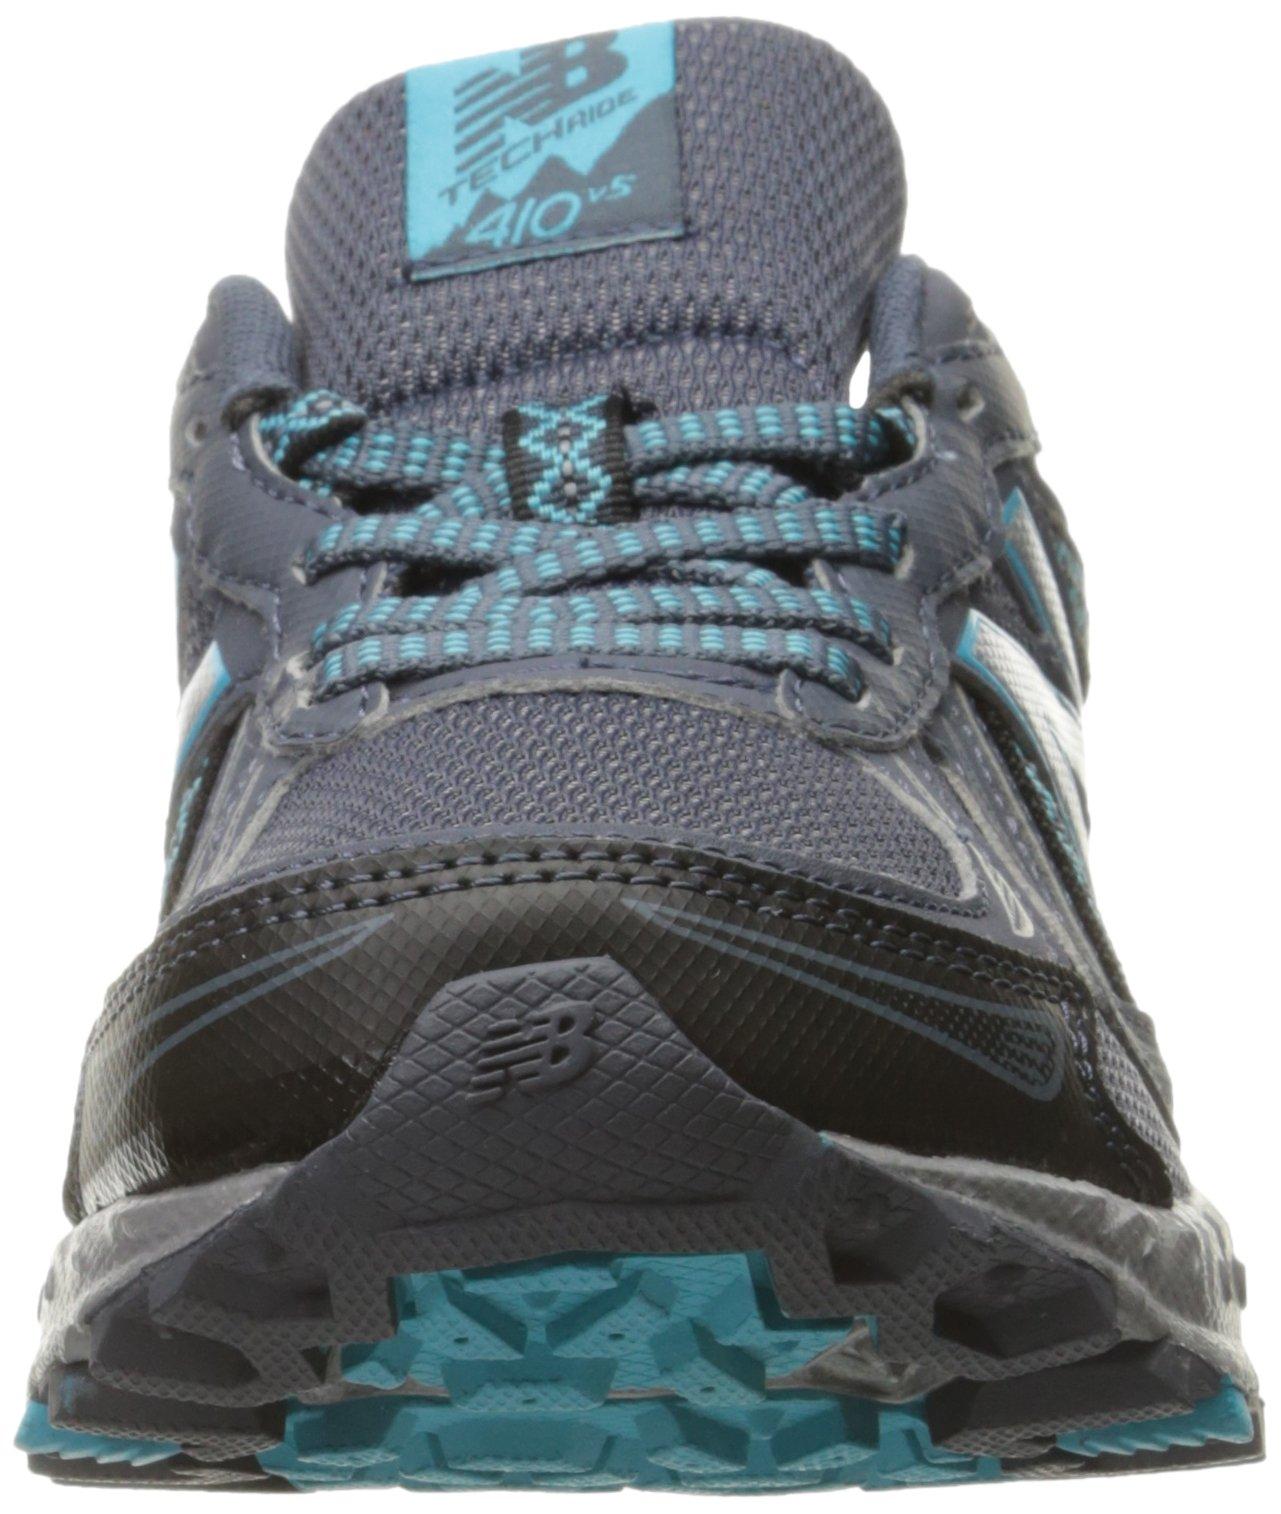 New Balance Women's WT410v5 Cushioning Trail Running Shoe